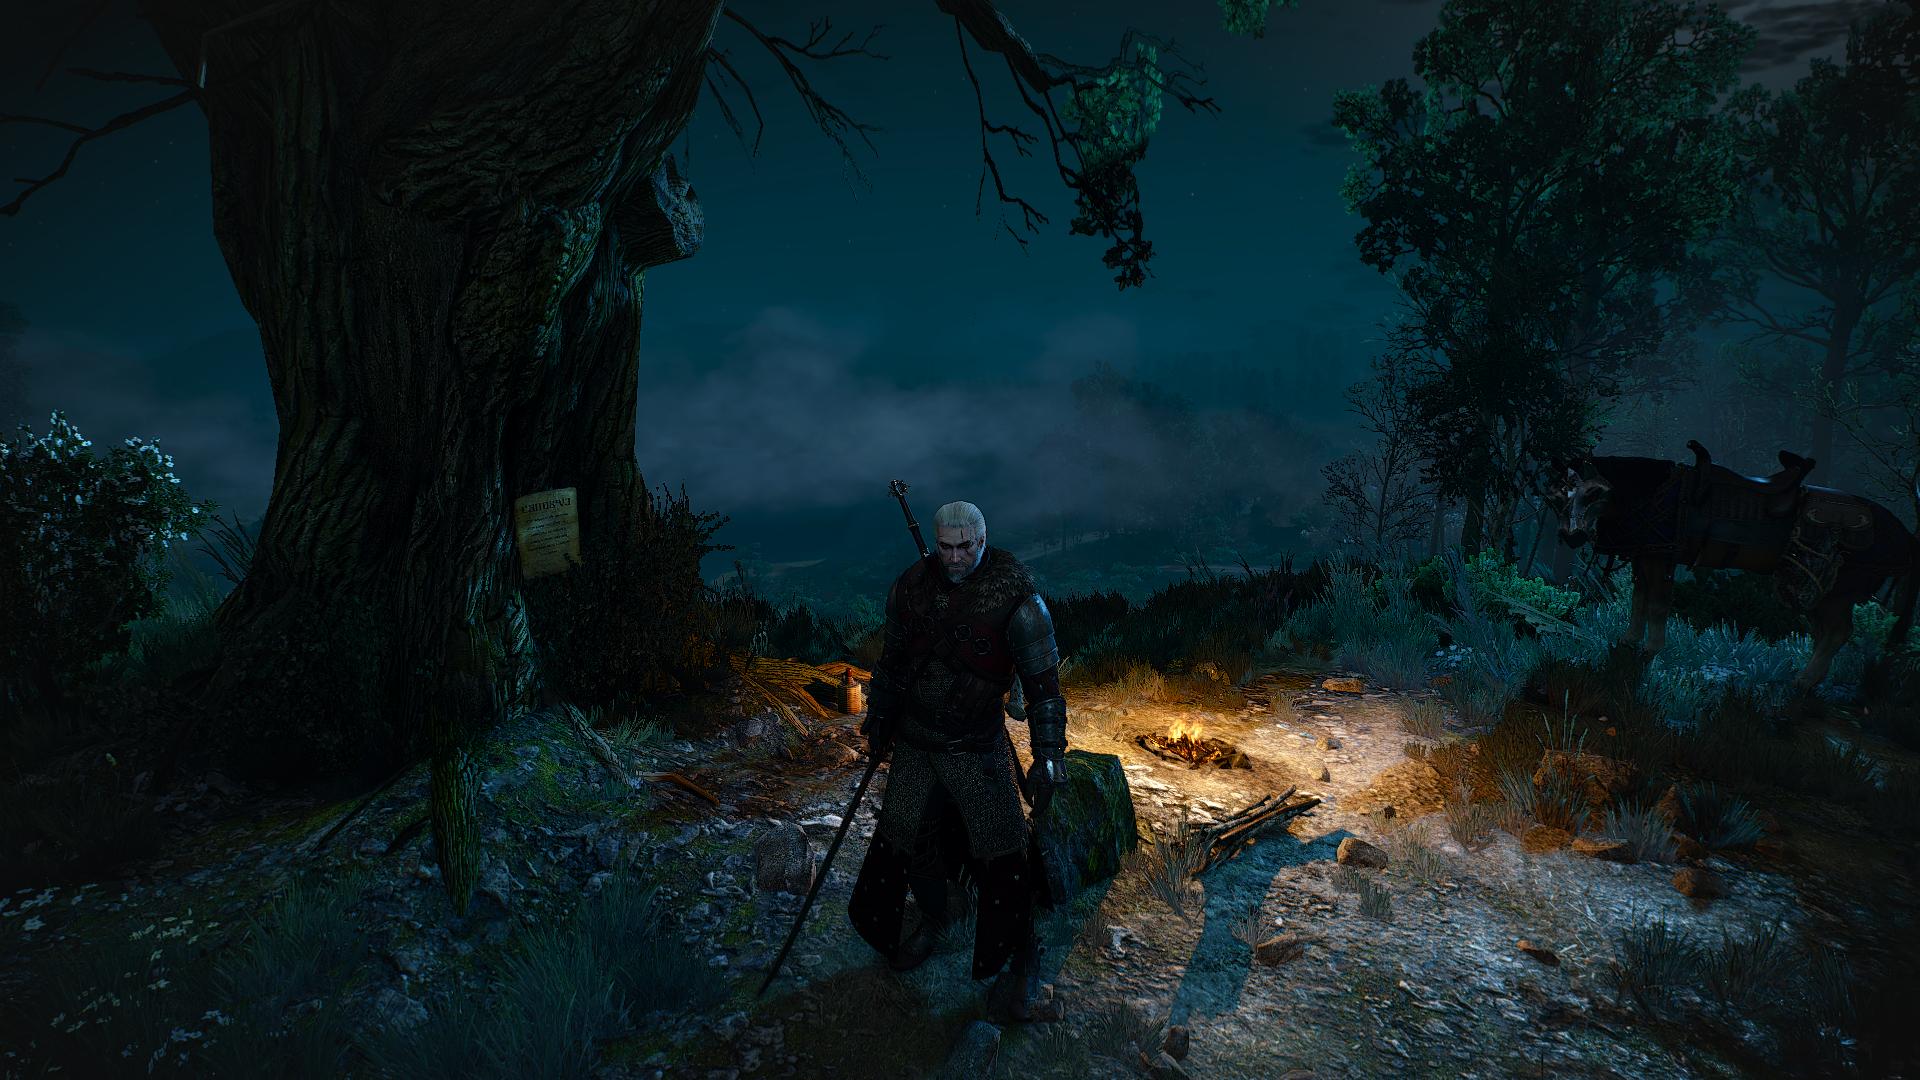 Где все началось, там все и закончилось - Witcher 3: Wild Hunt, the